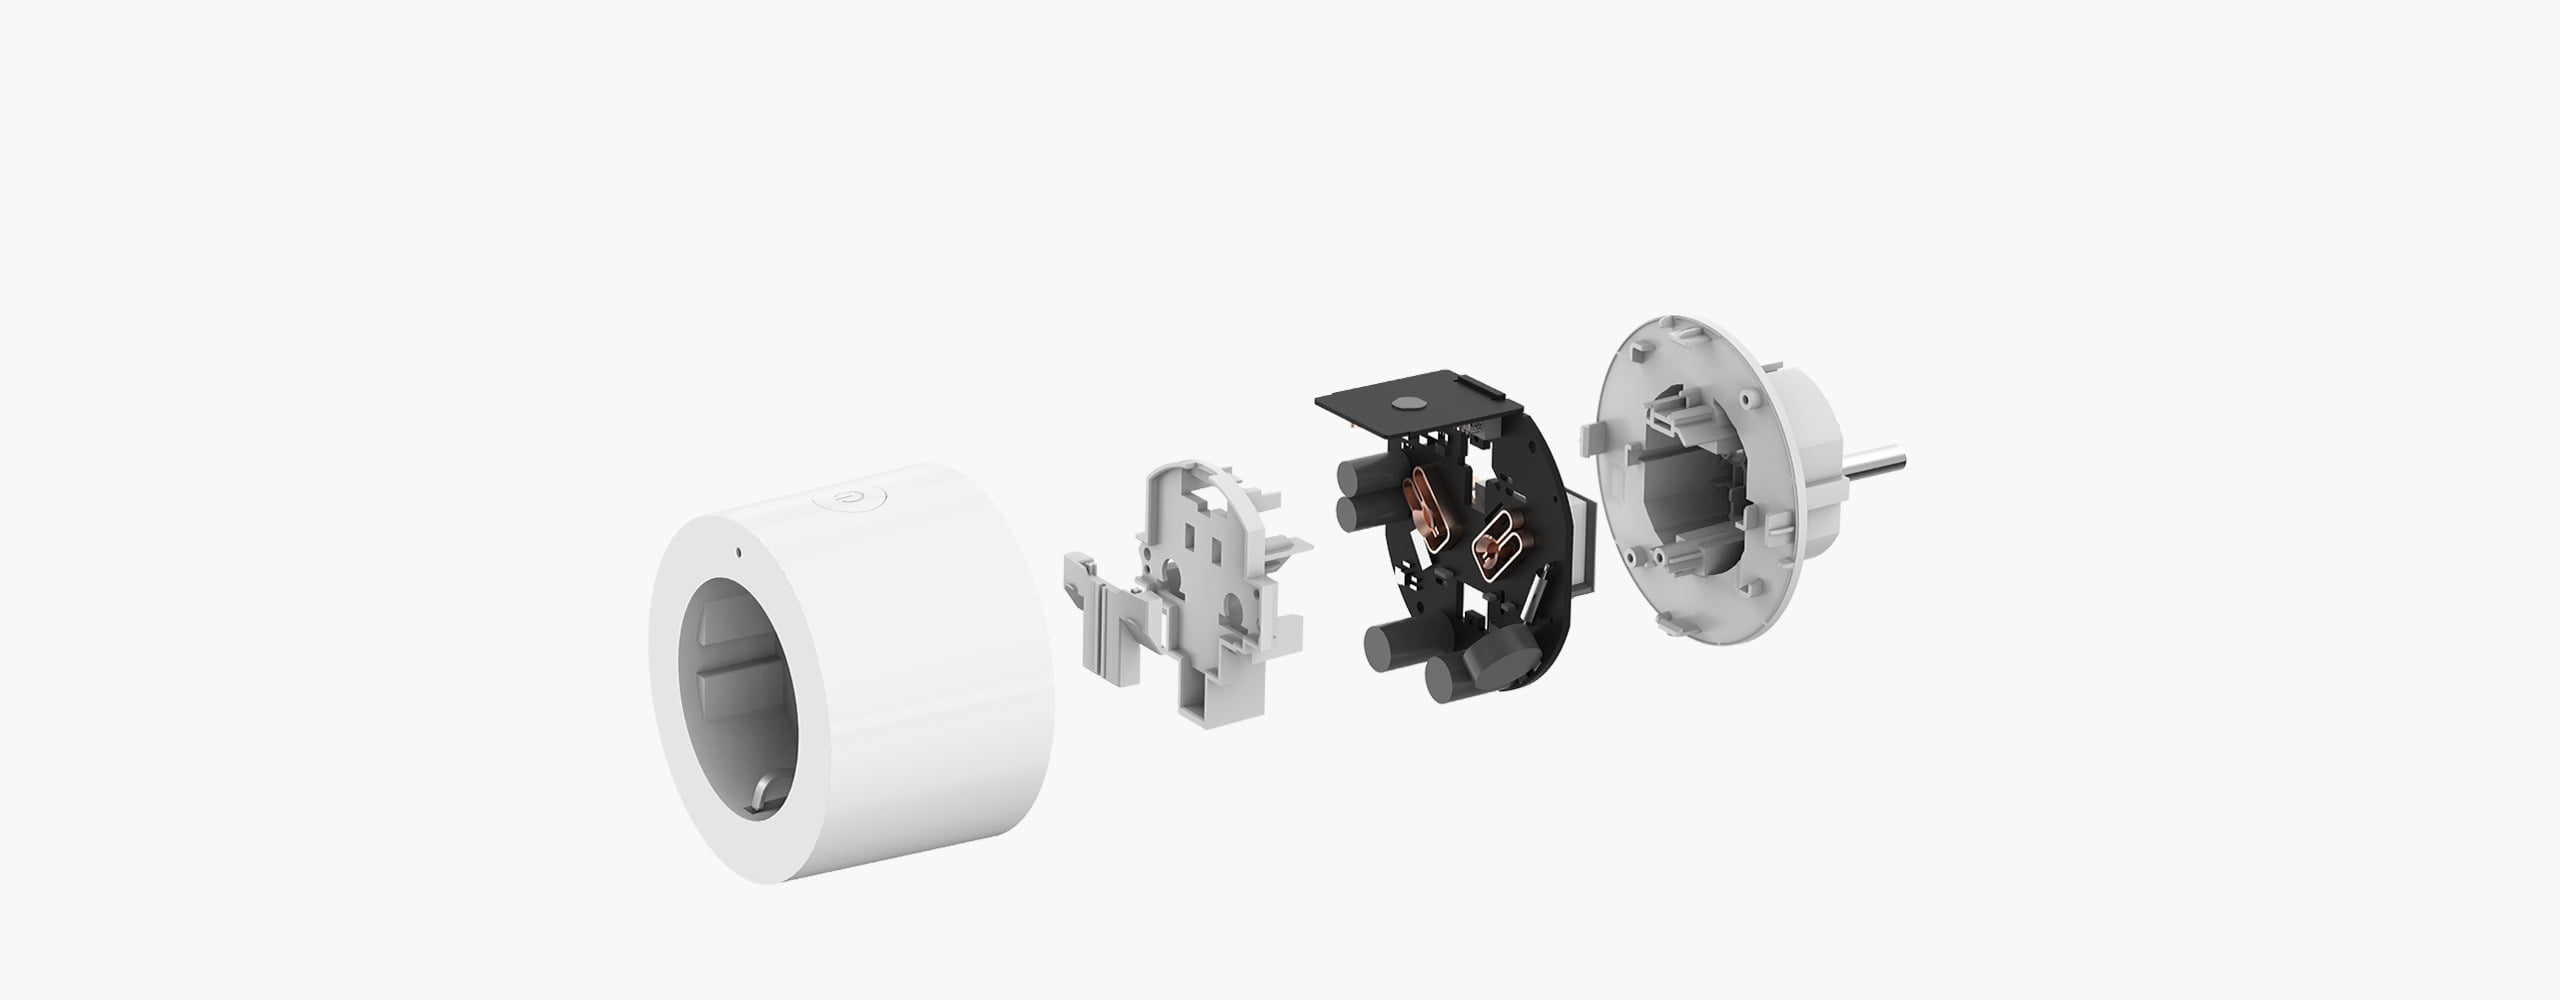 Sp Euc01 Aqara Smart Plug